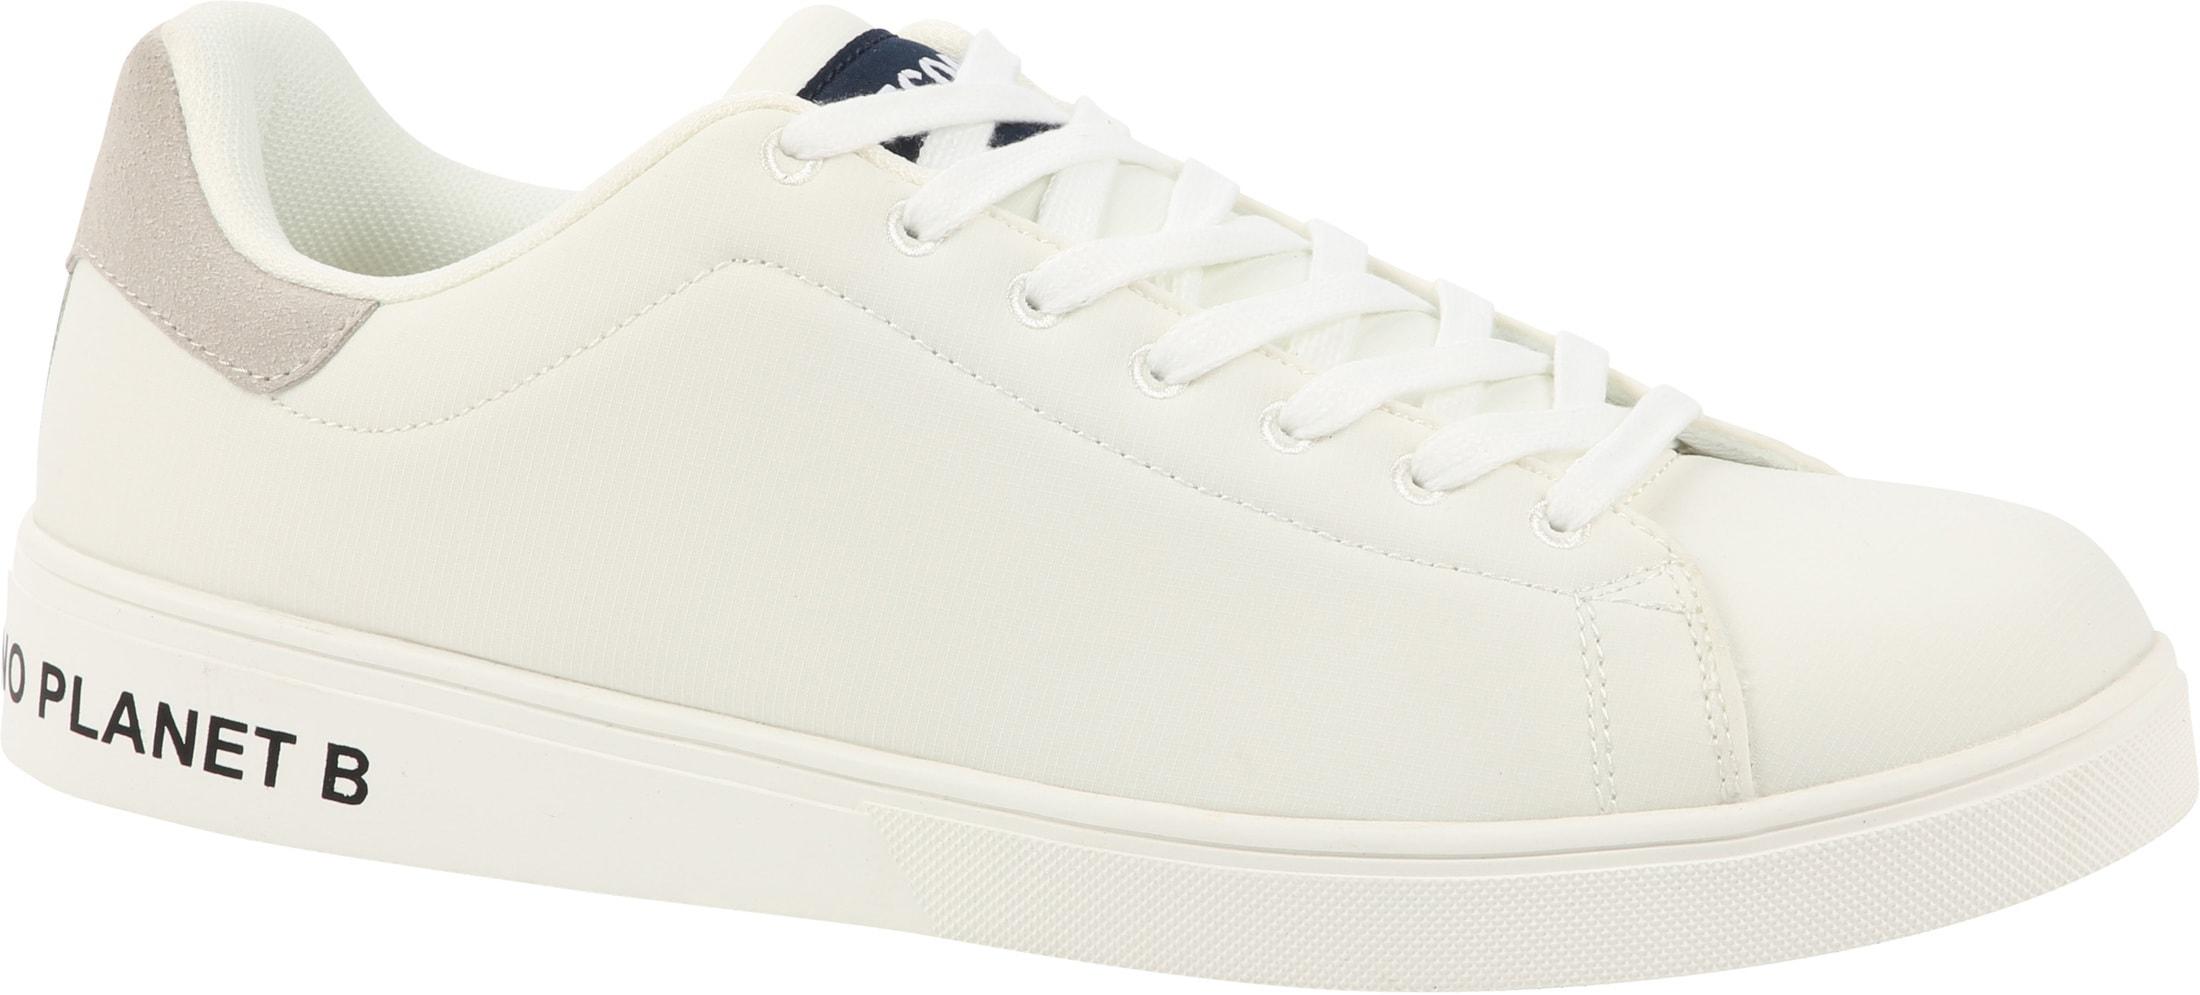 Ecoalf Sneaker Sanford Off-White foto 0